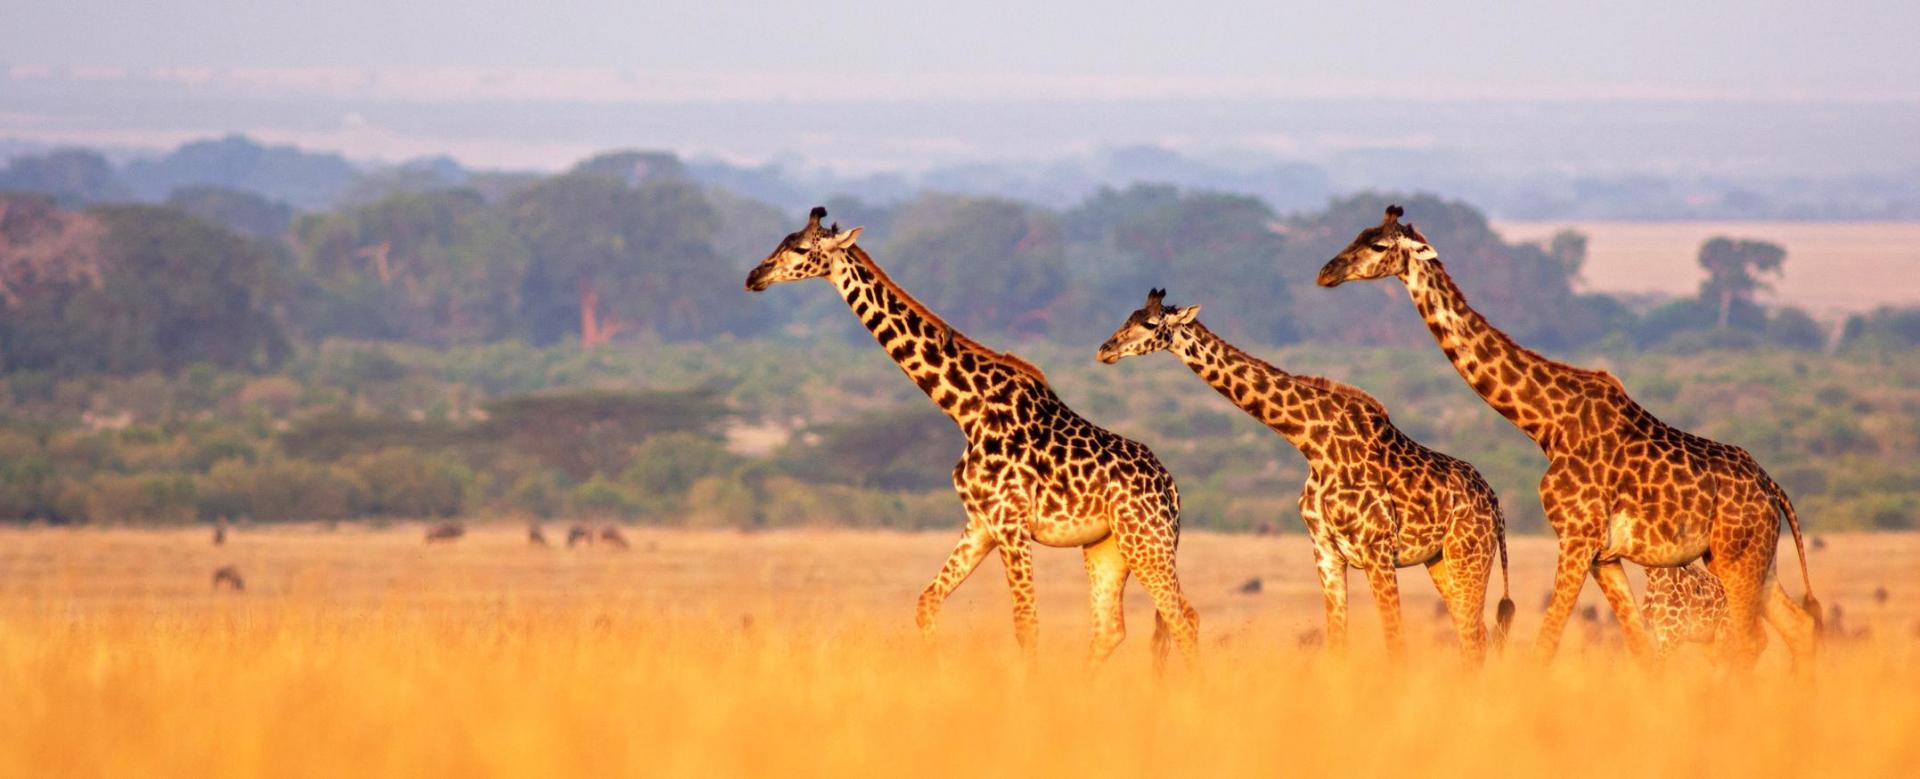 Voyage à pied : Tanzanie : lac natron et safari